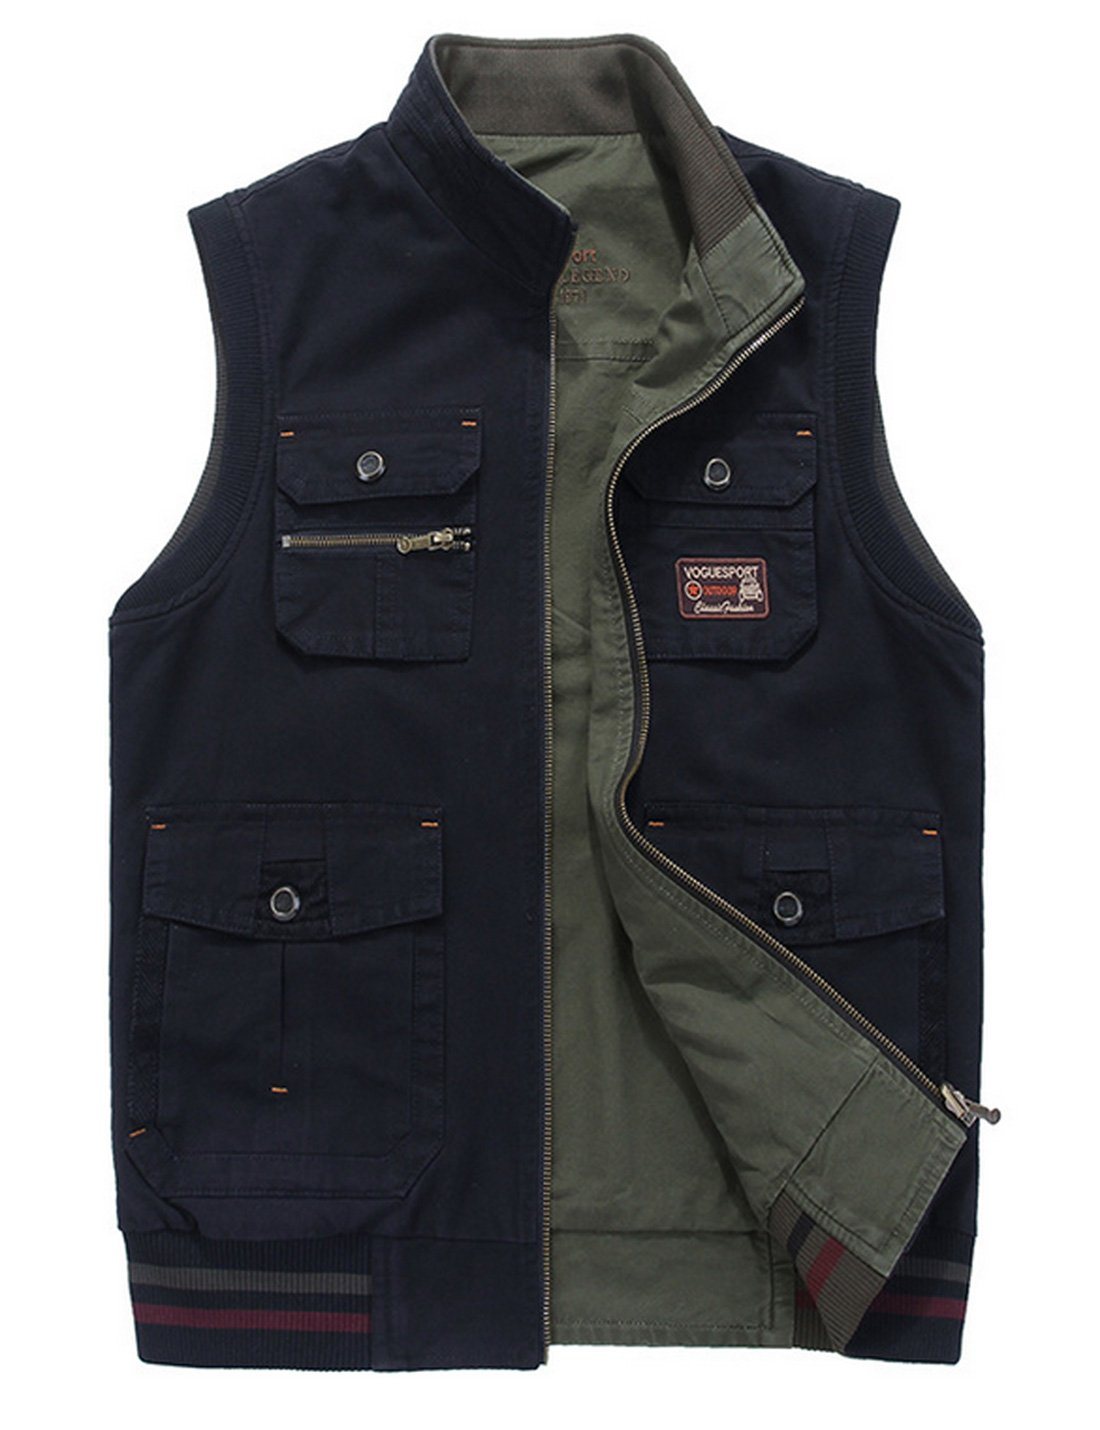 Gihuo Men's Reversible Cotton Leisure Outdoor Pockets Fish Photo Journalist Vest (XX-L, Navy)